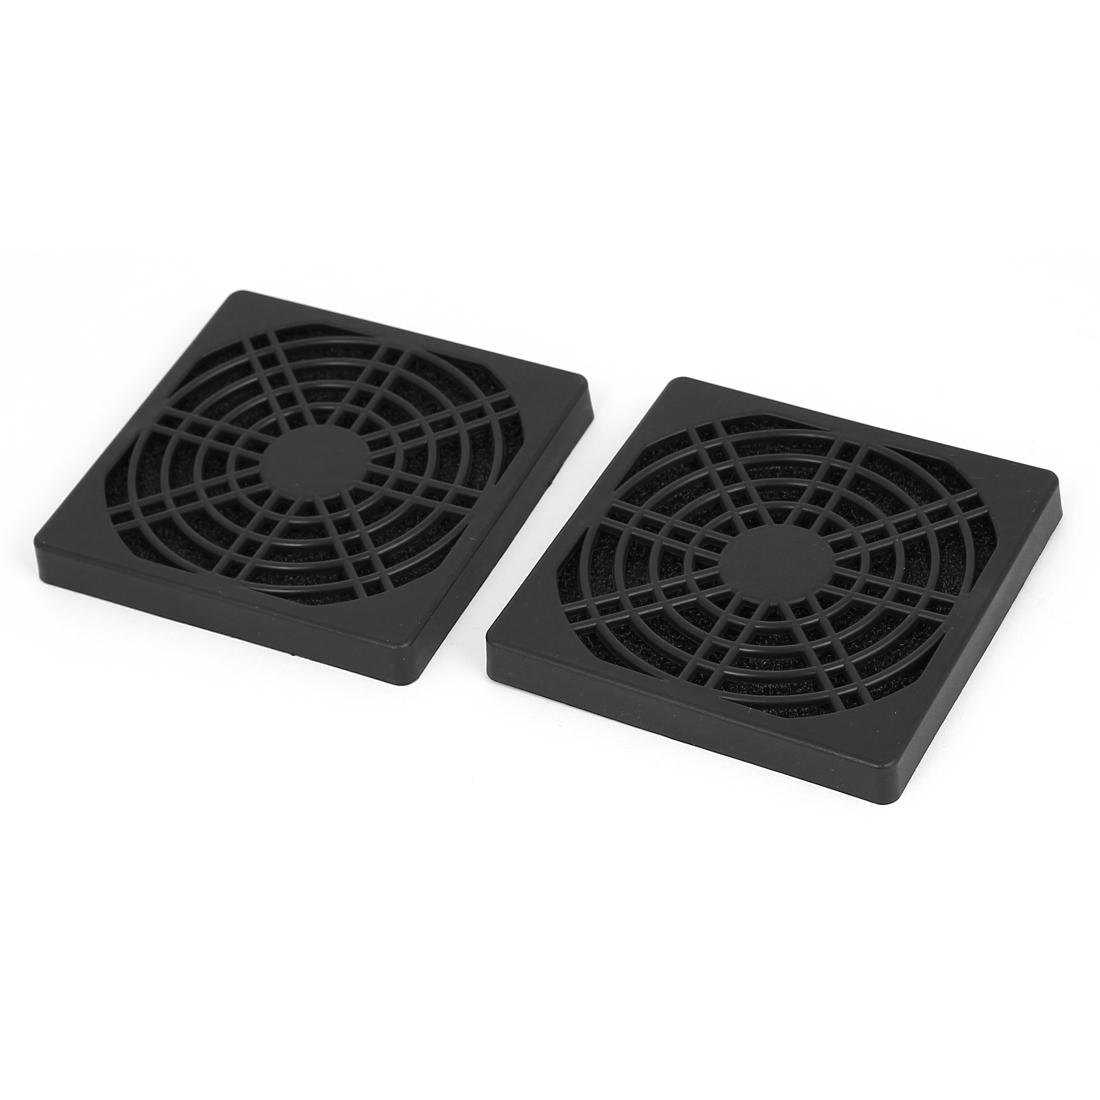 2pcs 85mm Black Plastic Computer PC Dustproof Cooler Cooling Fan Case Cover Dust Filter Protector Net